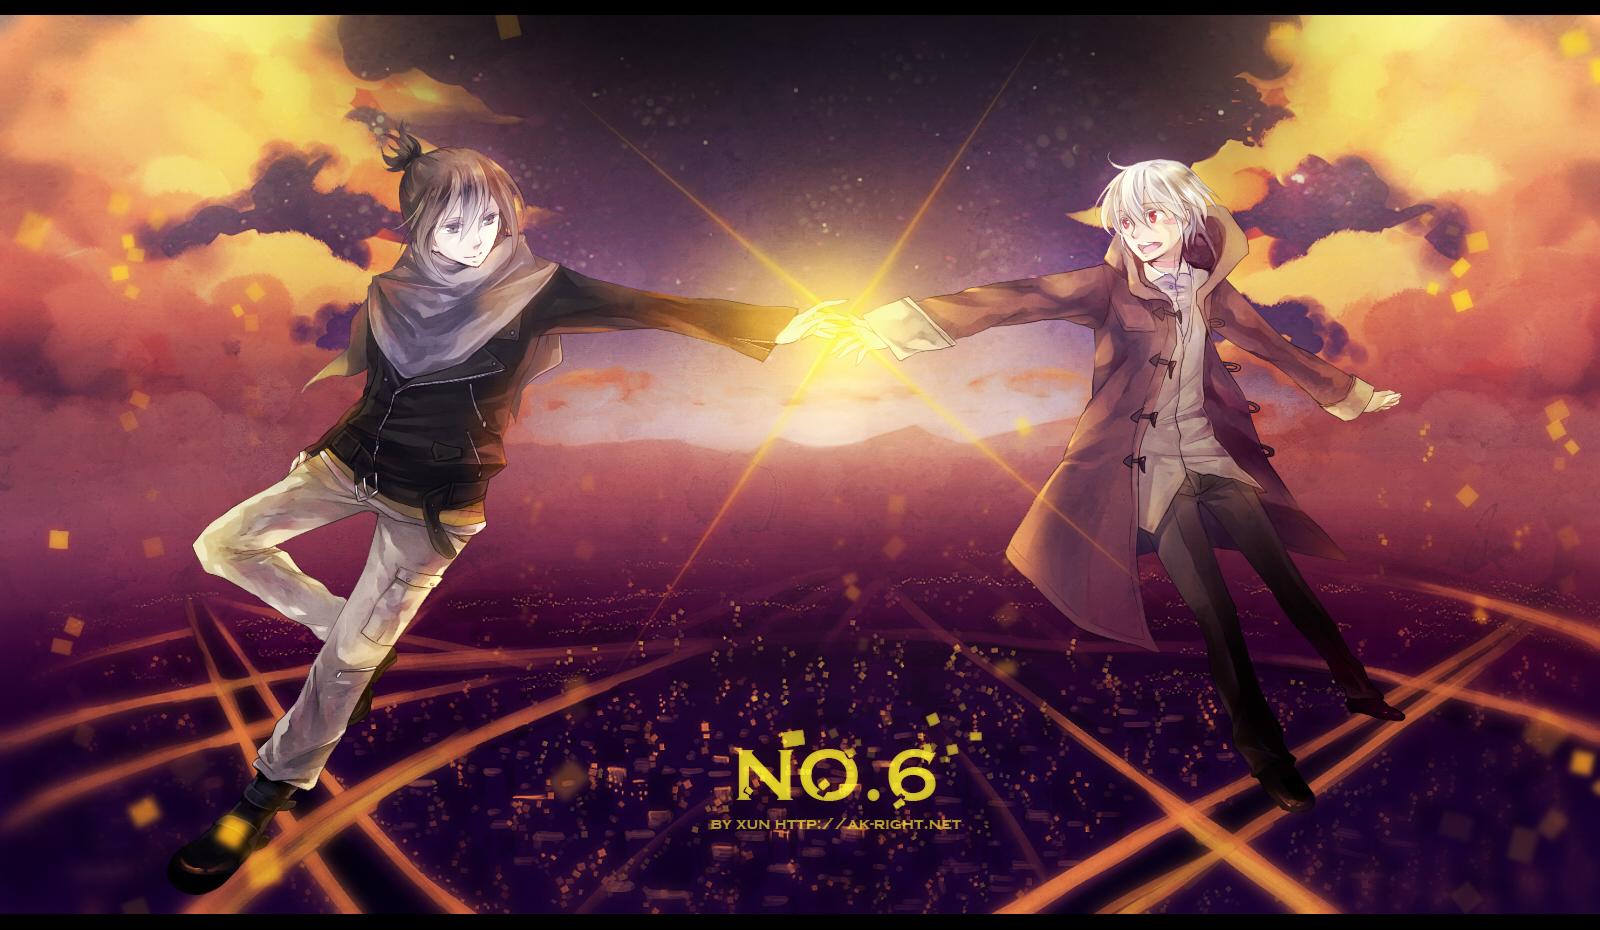 No6 Wallpaper 662787 Zerochan Anime Image Board